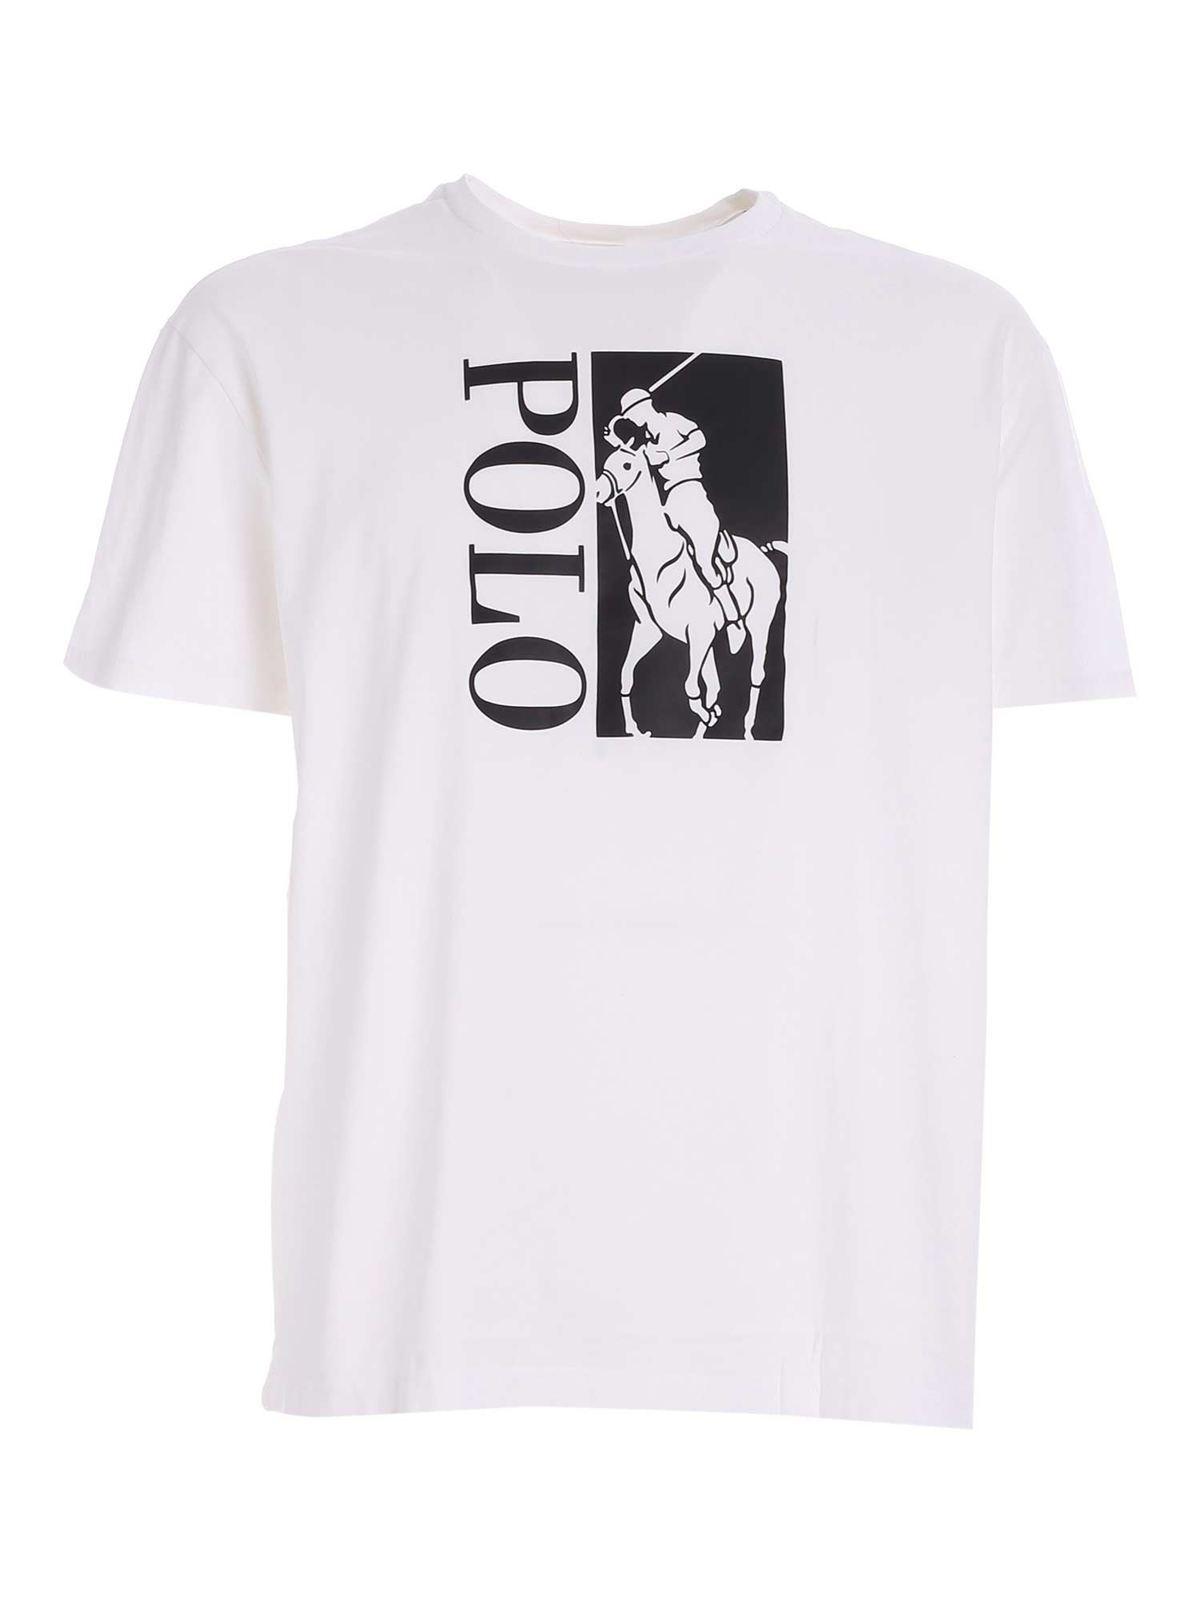 Polo Ralph Lauren BLACK LOGO PRINT T-SHIRT IN WHITE